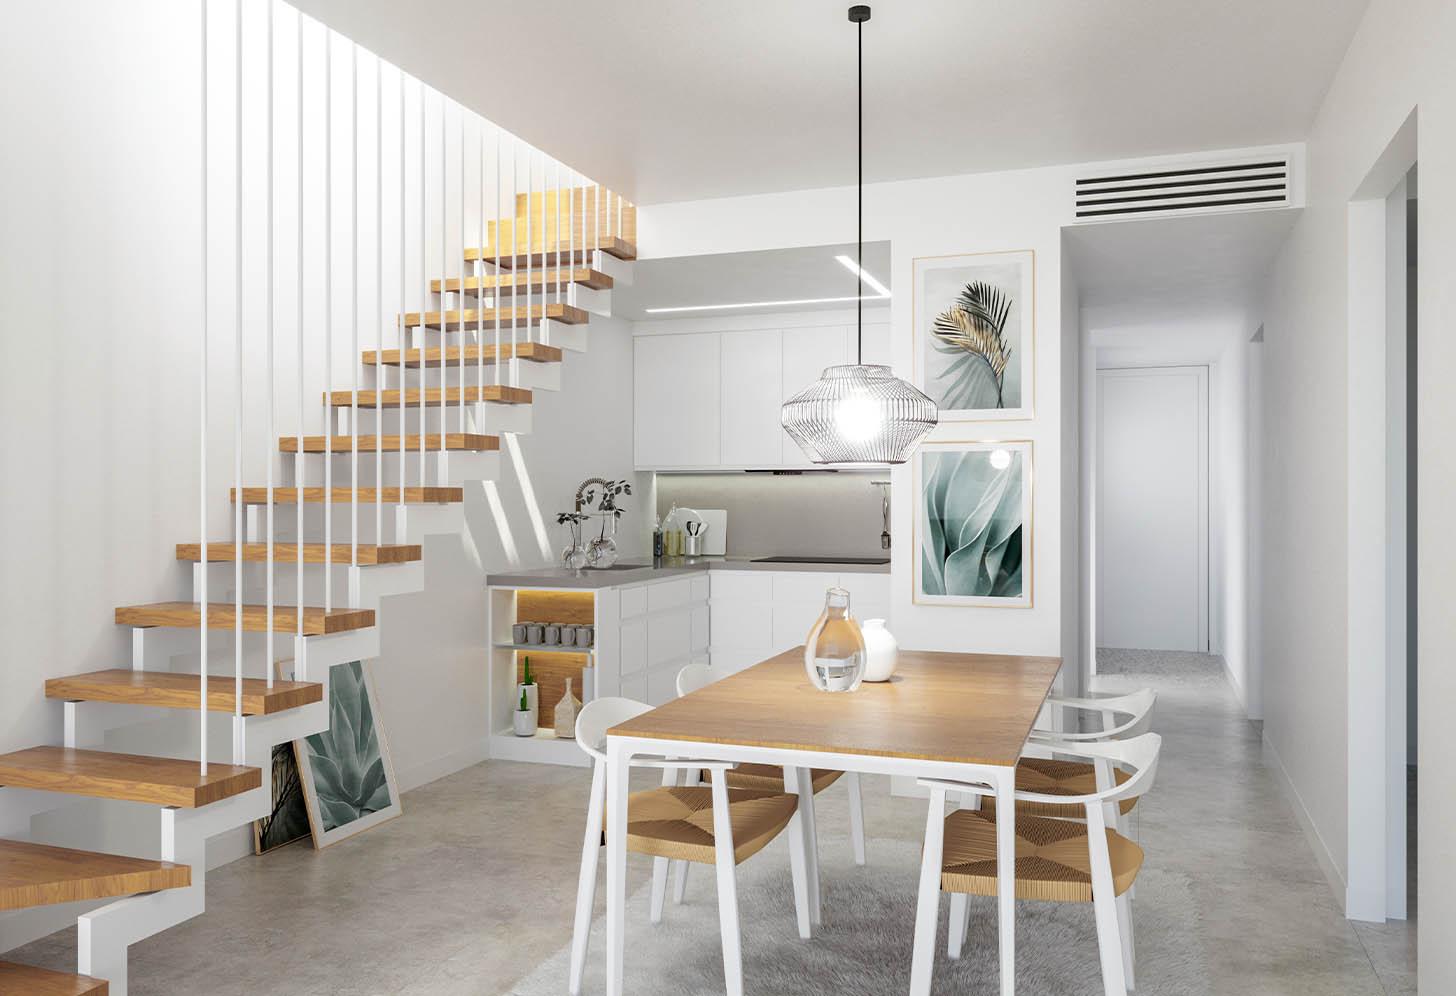 immobilier neuf espagne costa blanca on-j1 iconic cuisine